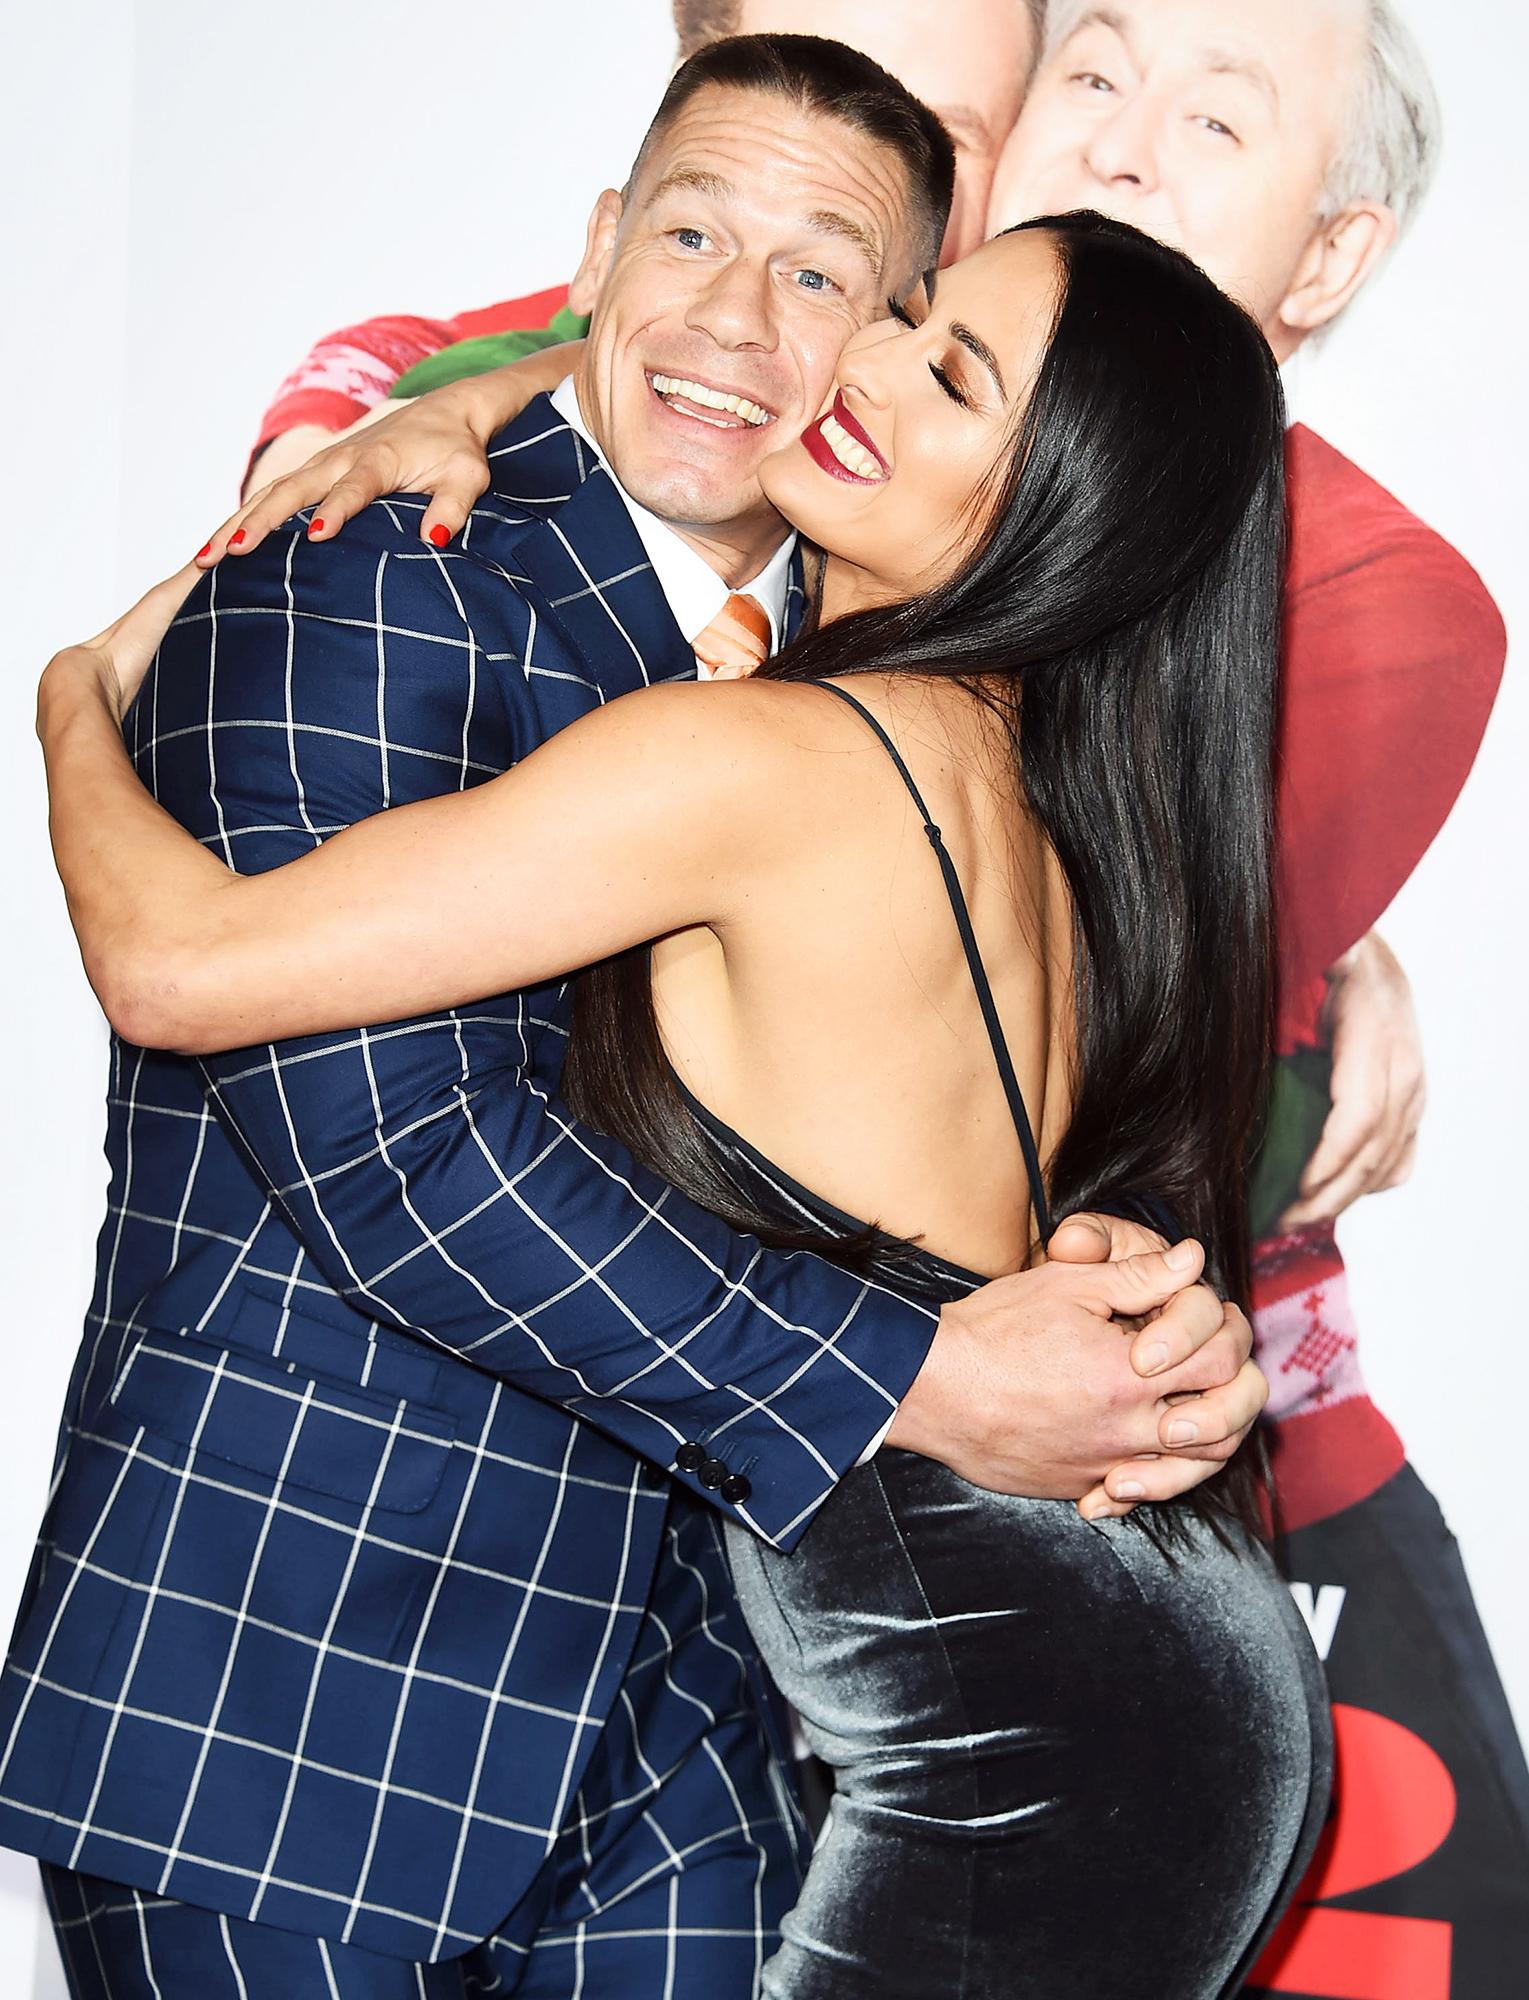 Hollywood's Broken Engagements: John Cena and Nikki Bella, More